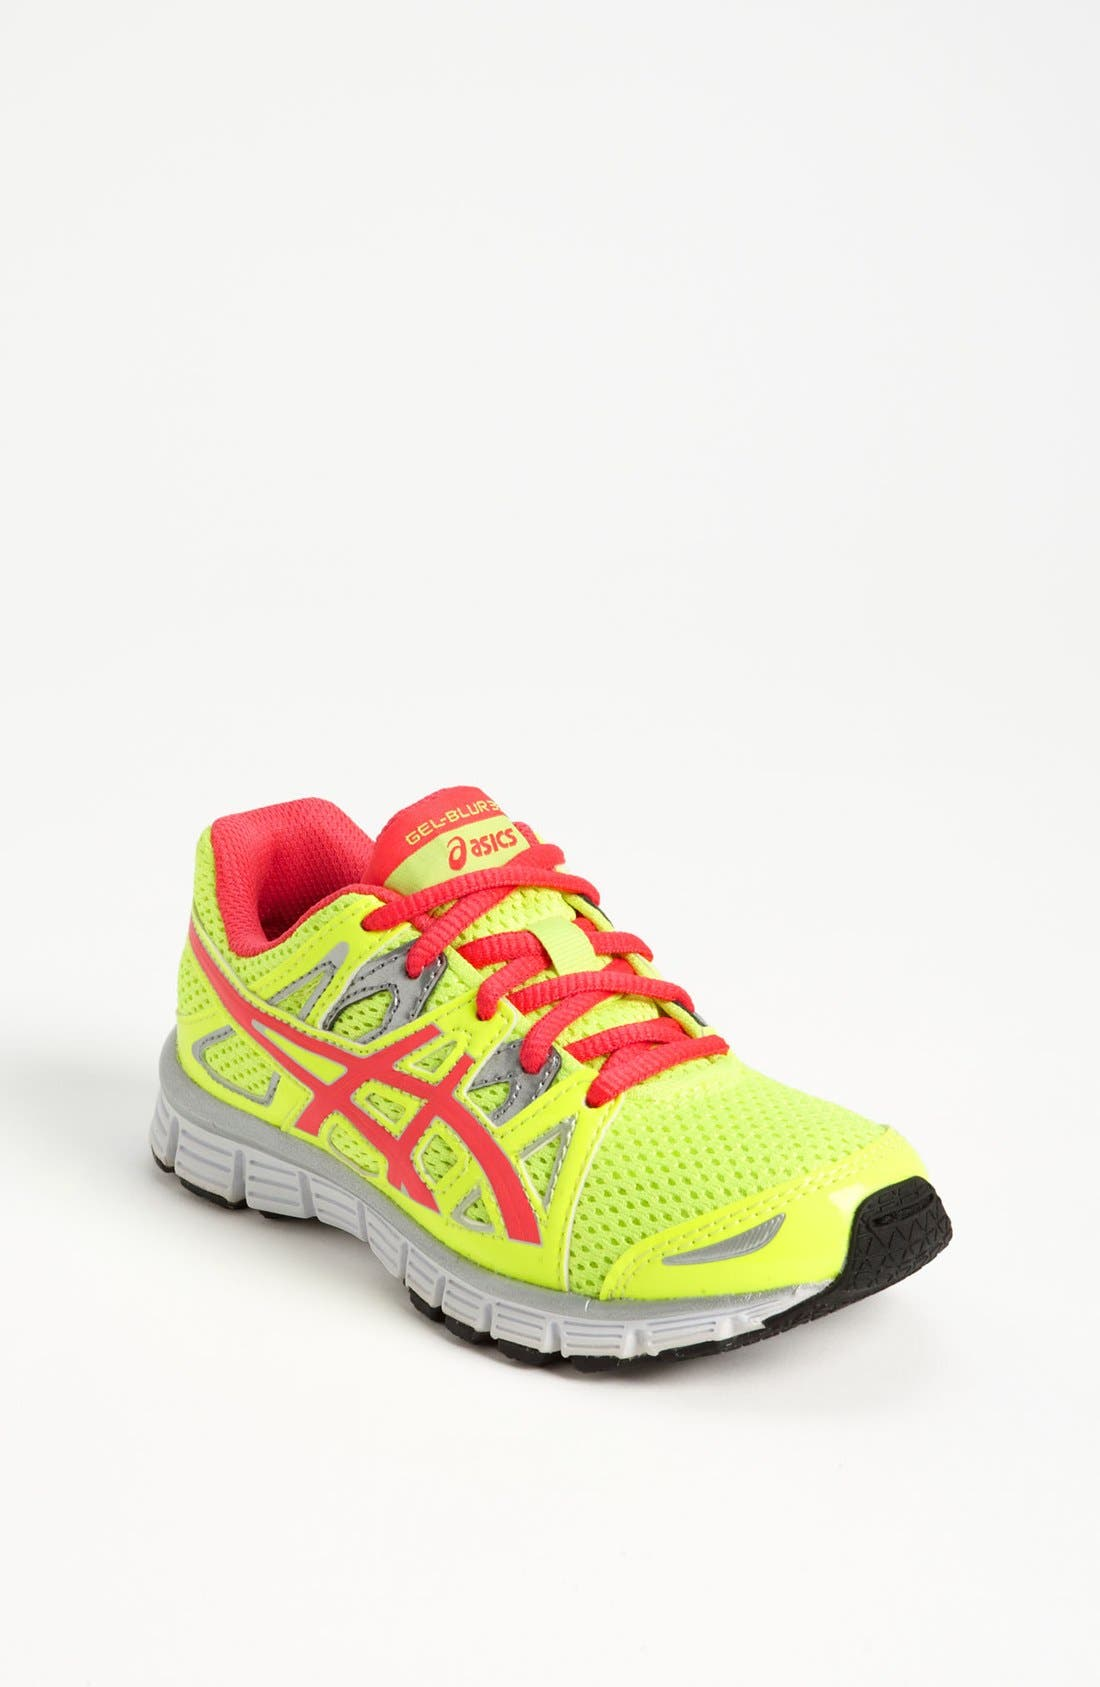 Alternate Image 1 Selected - ASICS® 'GEL-Blur 33 2.0' Training Shoe (Little Kid & Big Kid)